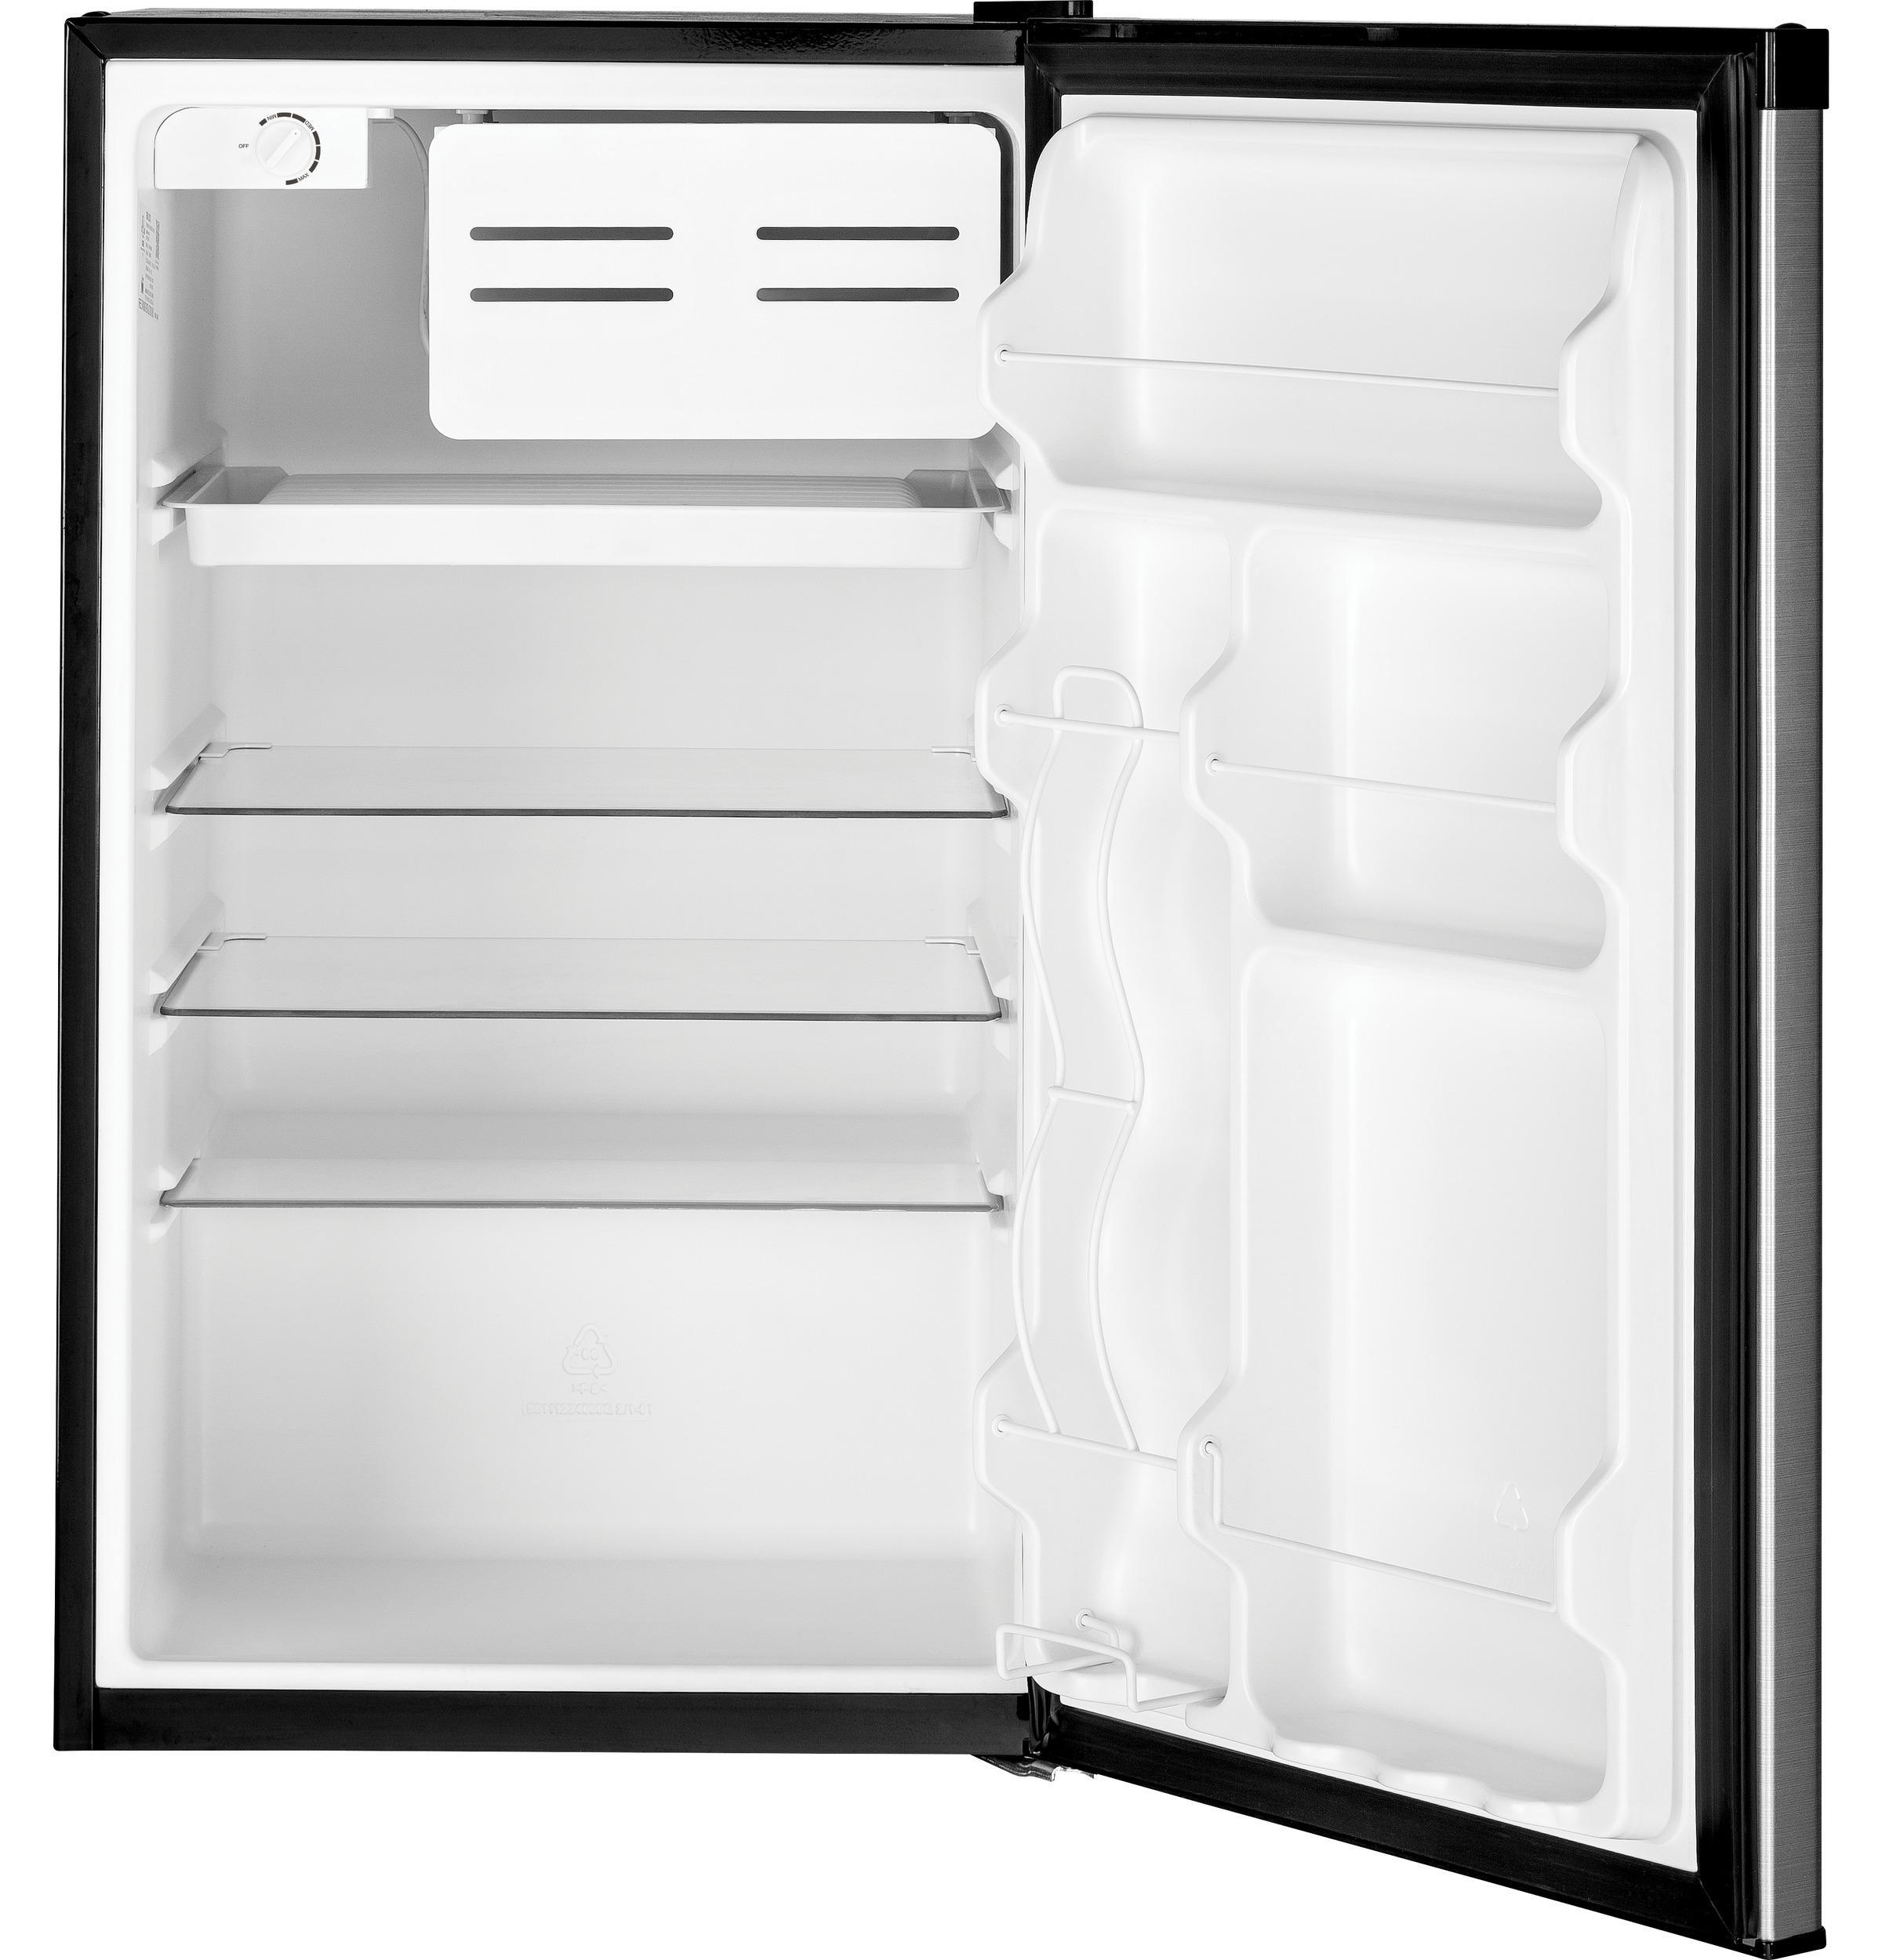 Model: GME04GLKLB | GE GE® Compact Refrigerator